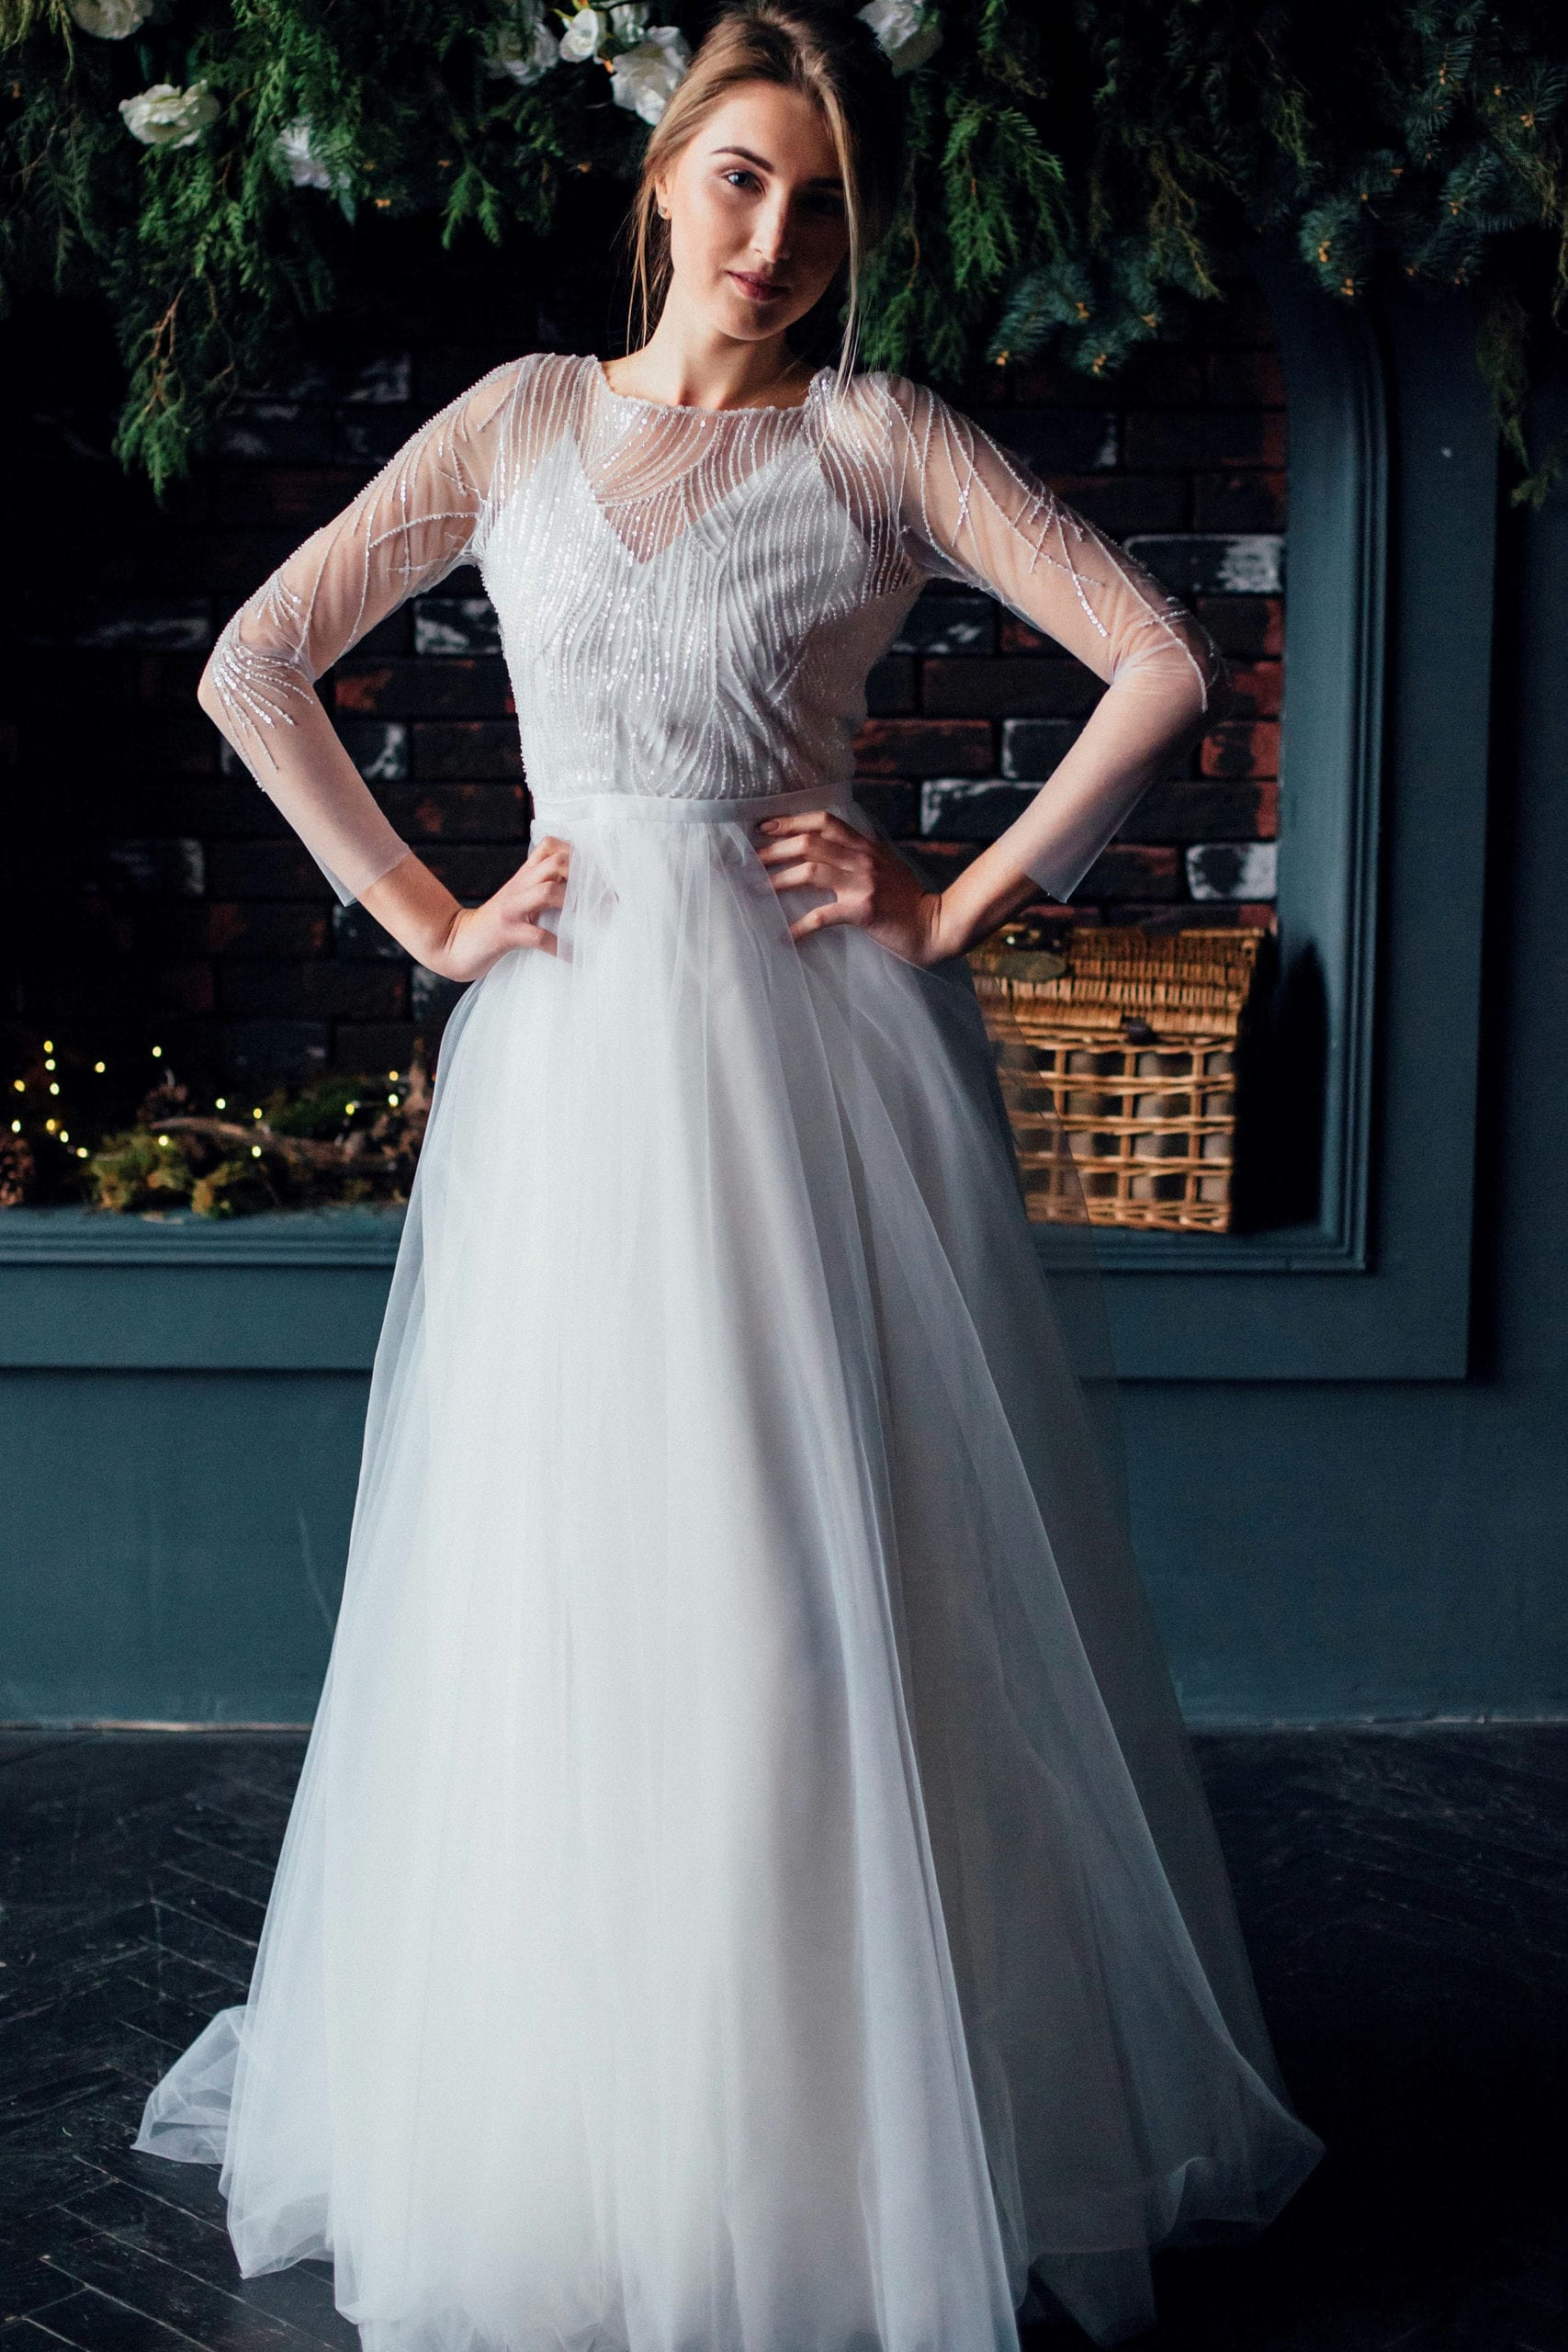 Свадебное платье EVELYN, коллекция THE ABSOLUTE LOVE, бренд RARE BRIDAL, фото 4